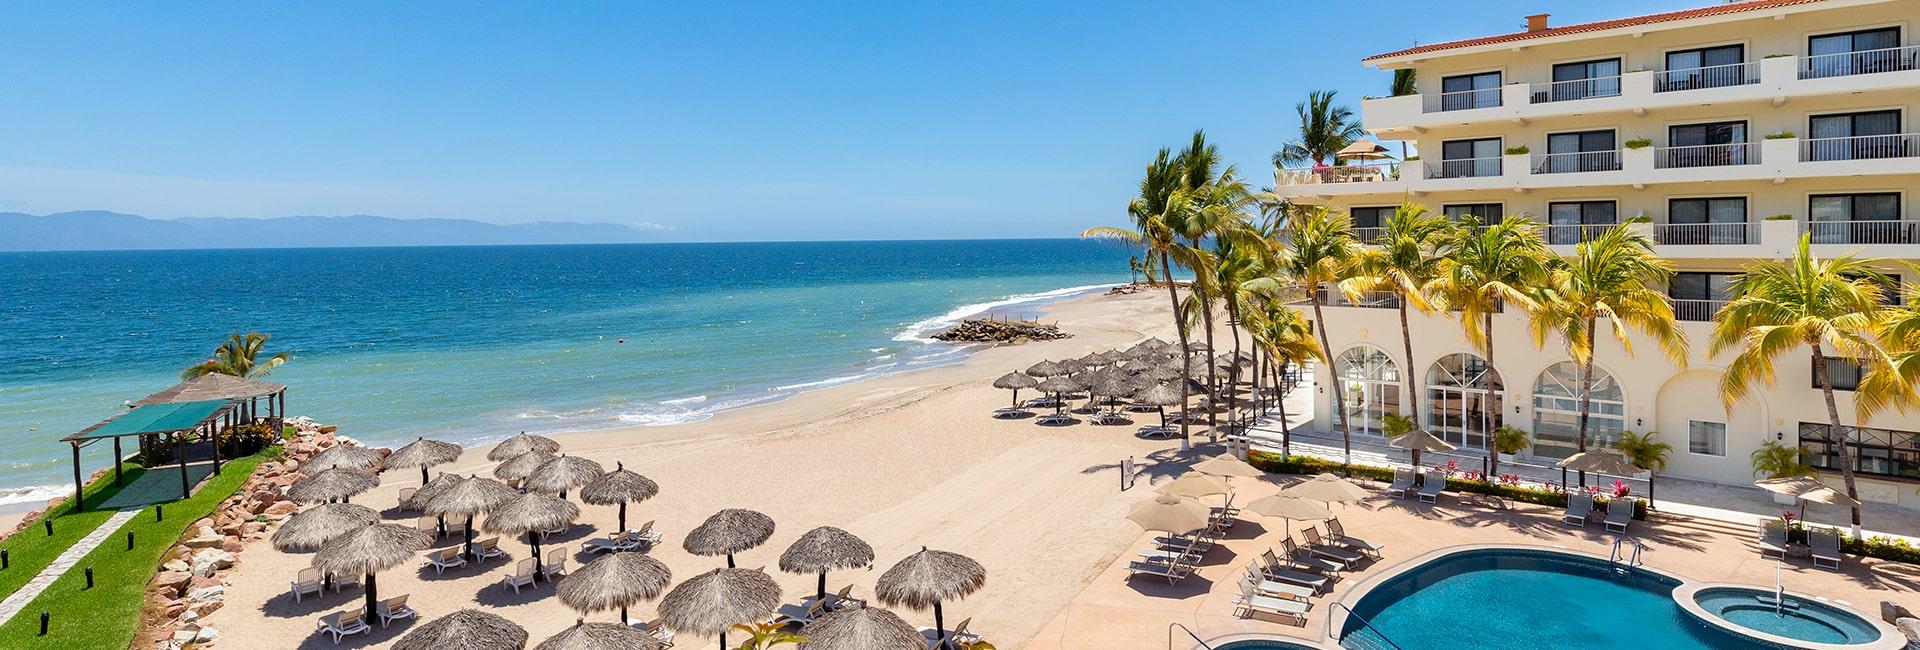 Villa del palmar vallarta wins tripadvisor travelers choice awards 2020 min